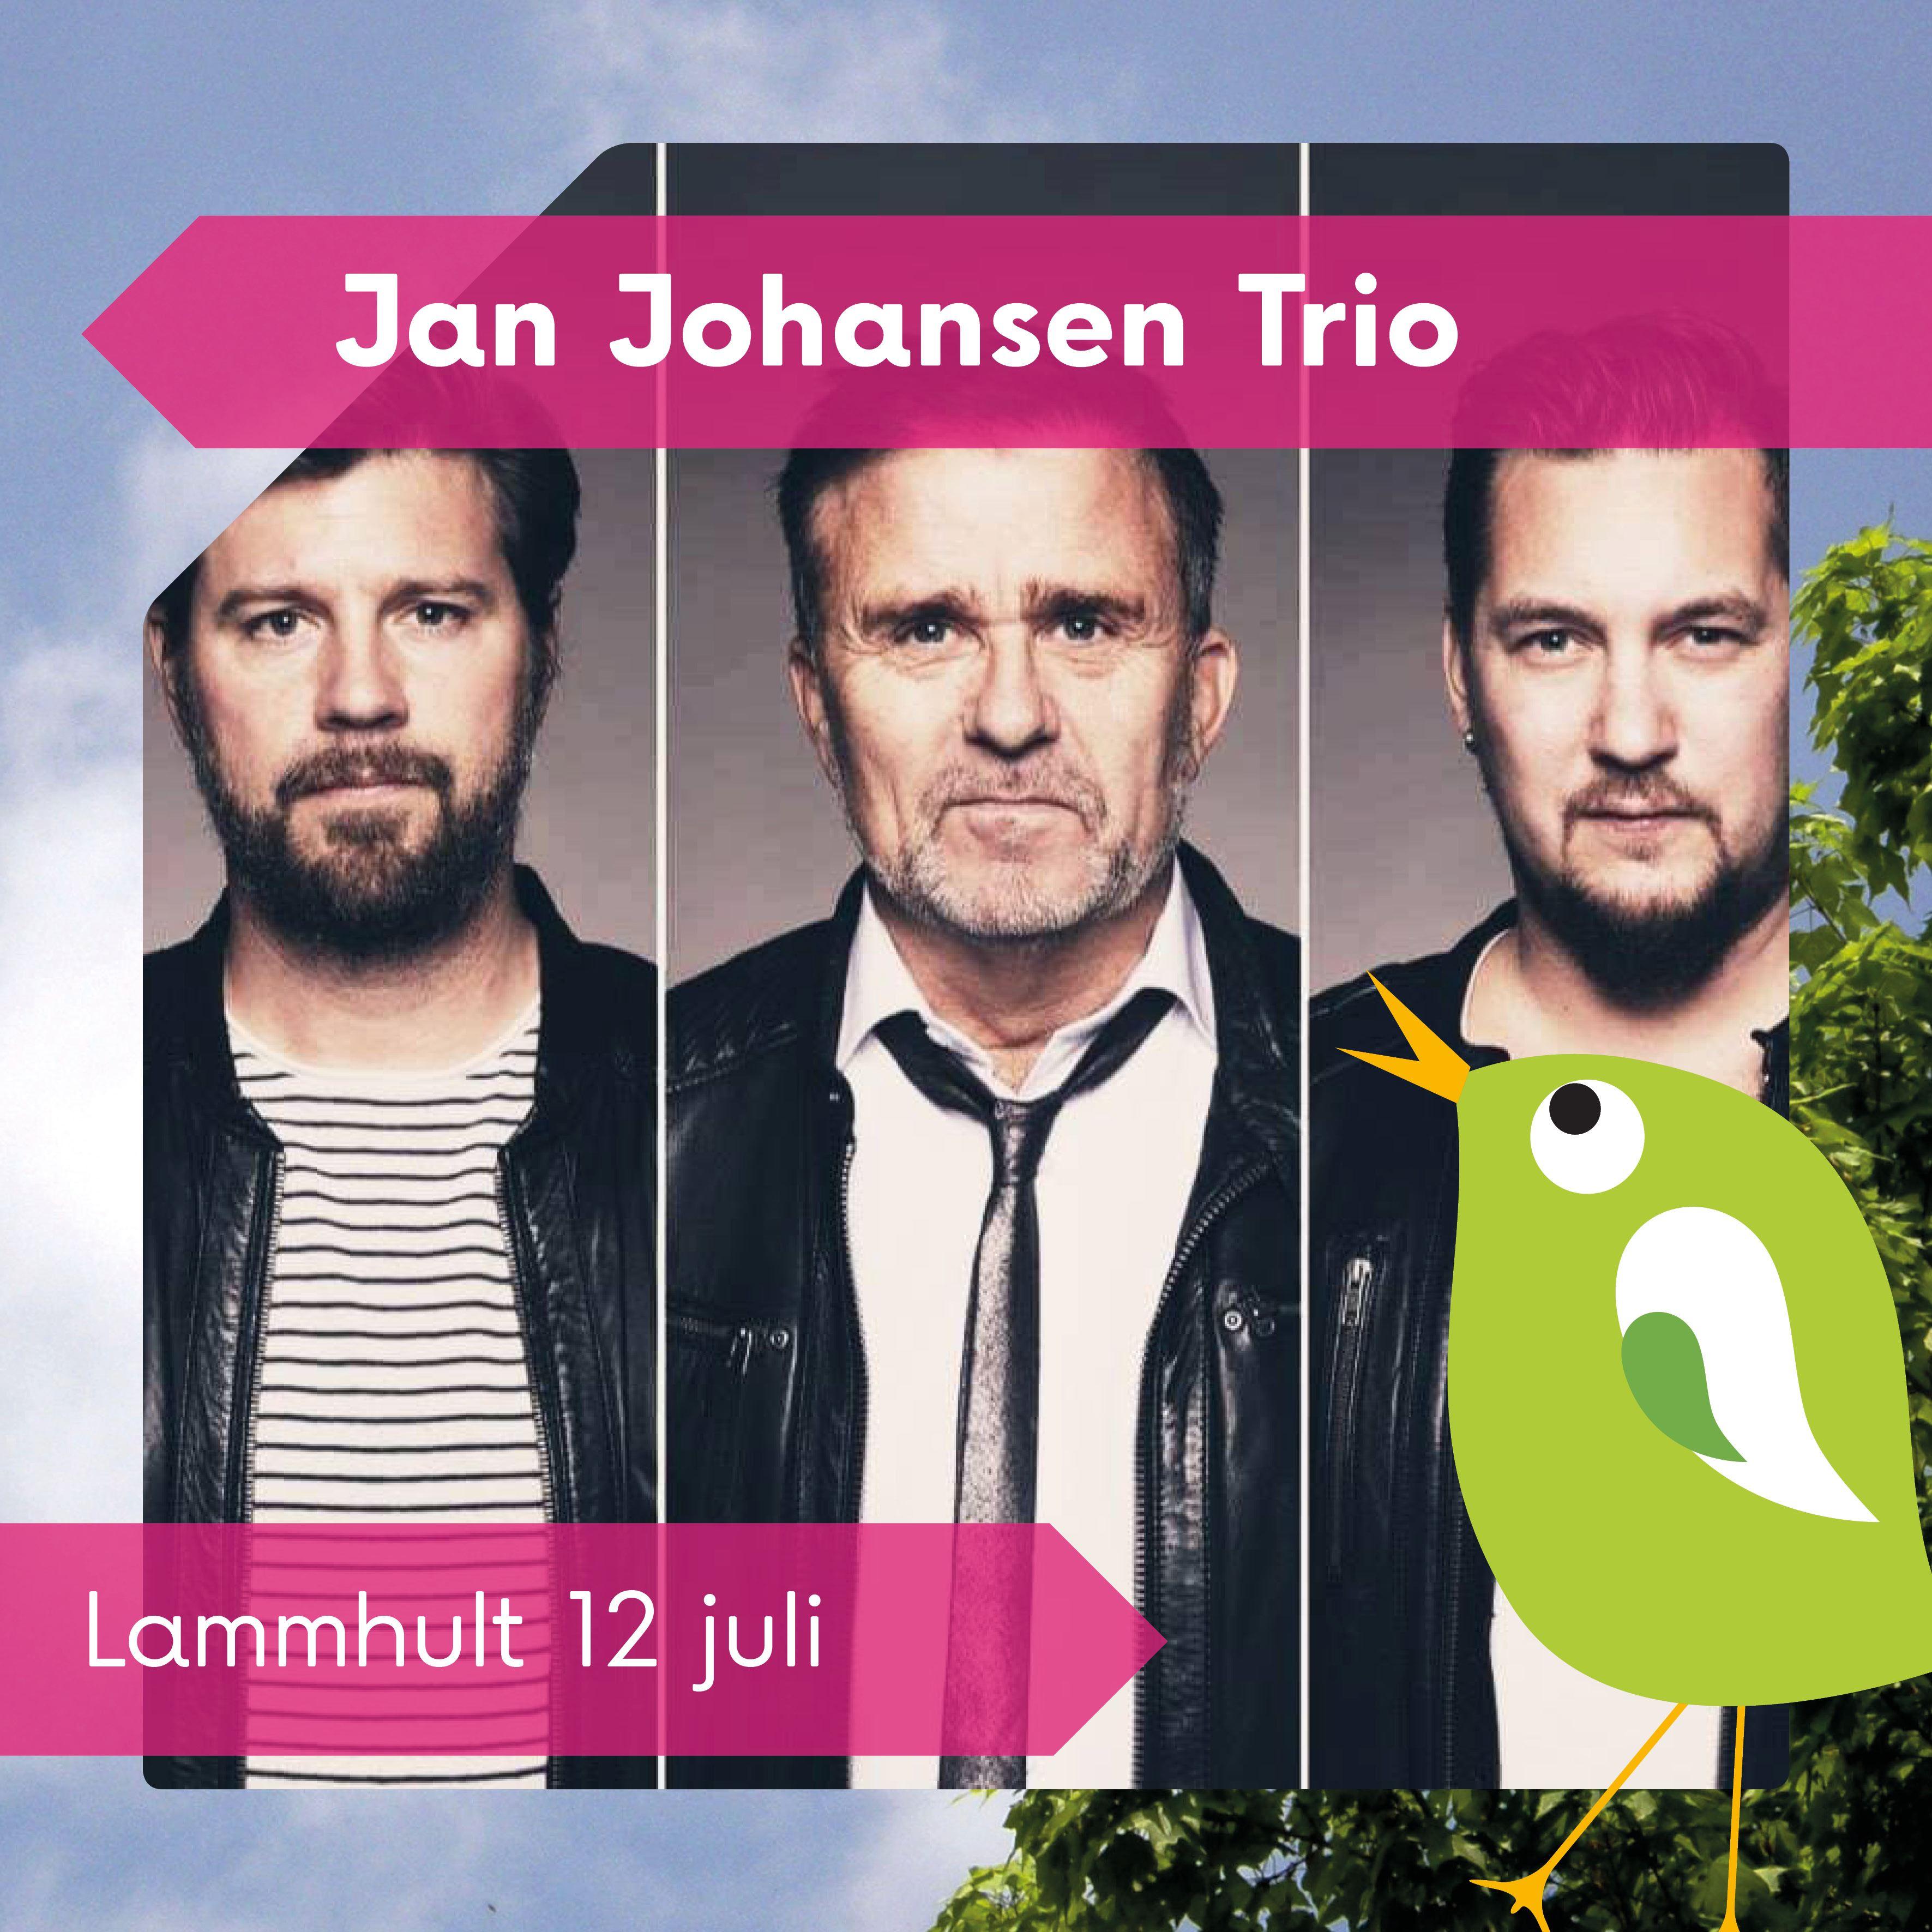 Scensommar: Jan Johansen Trio